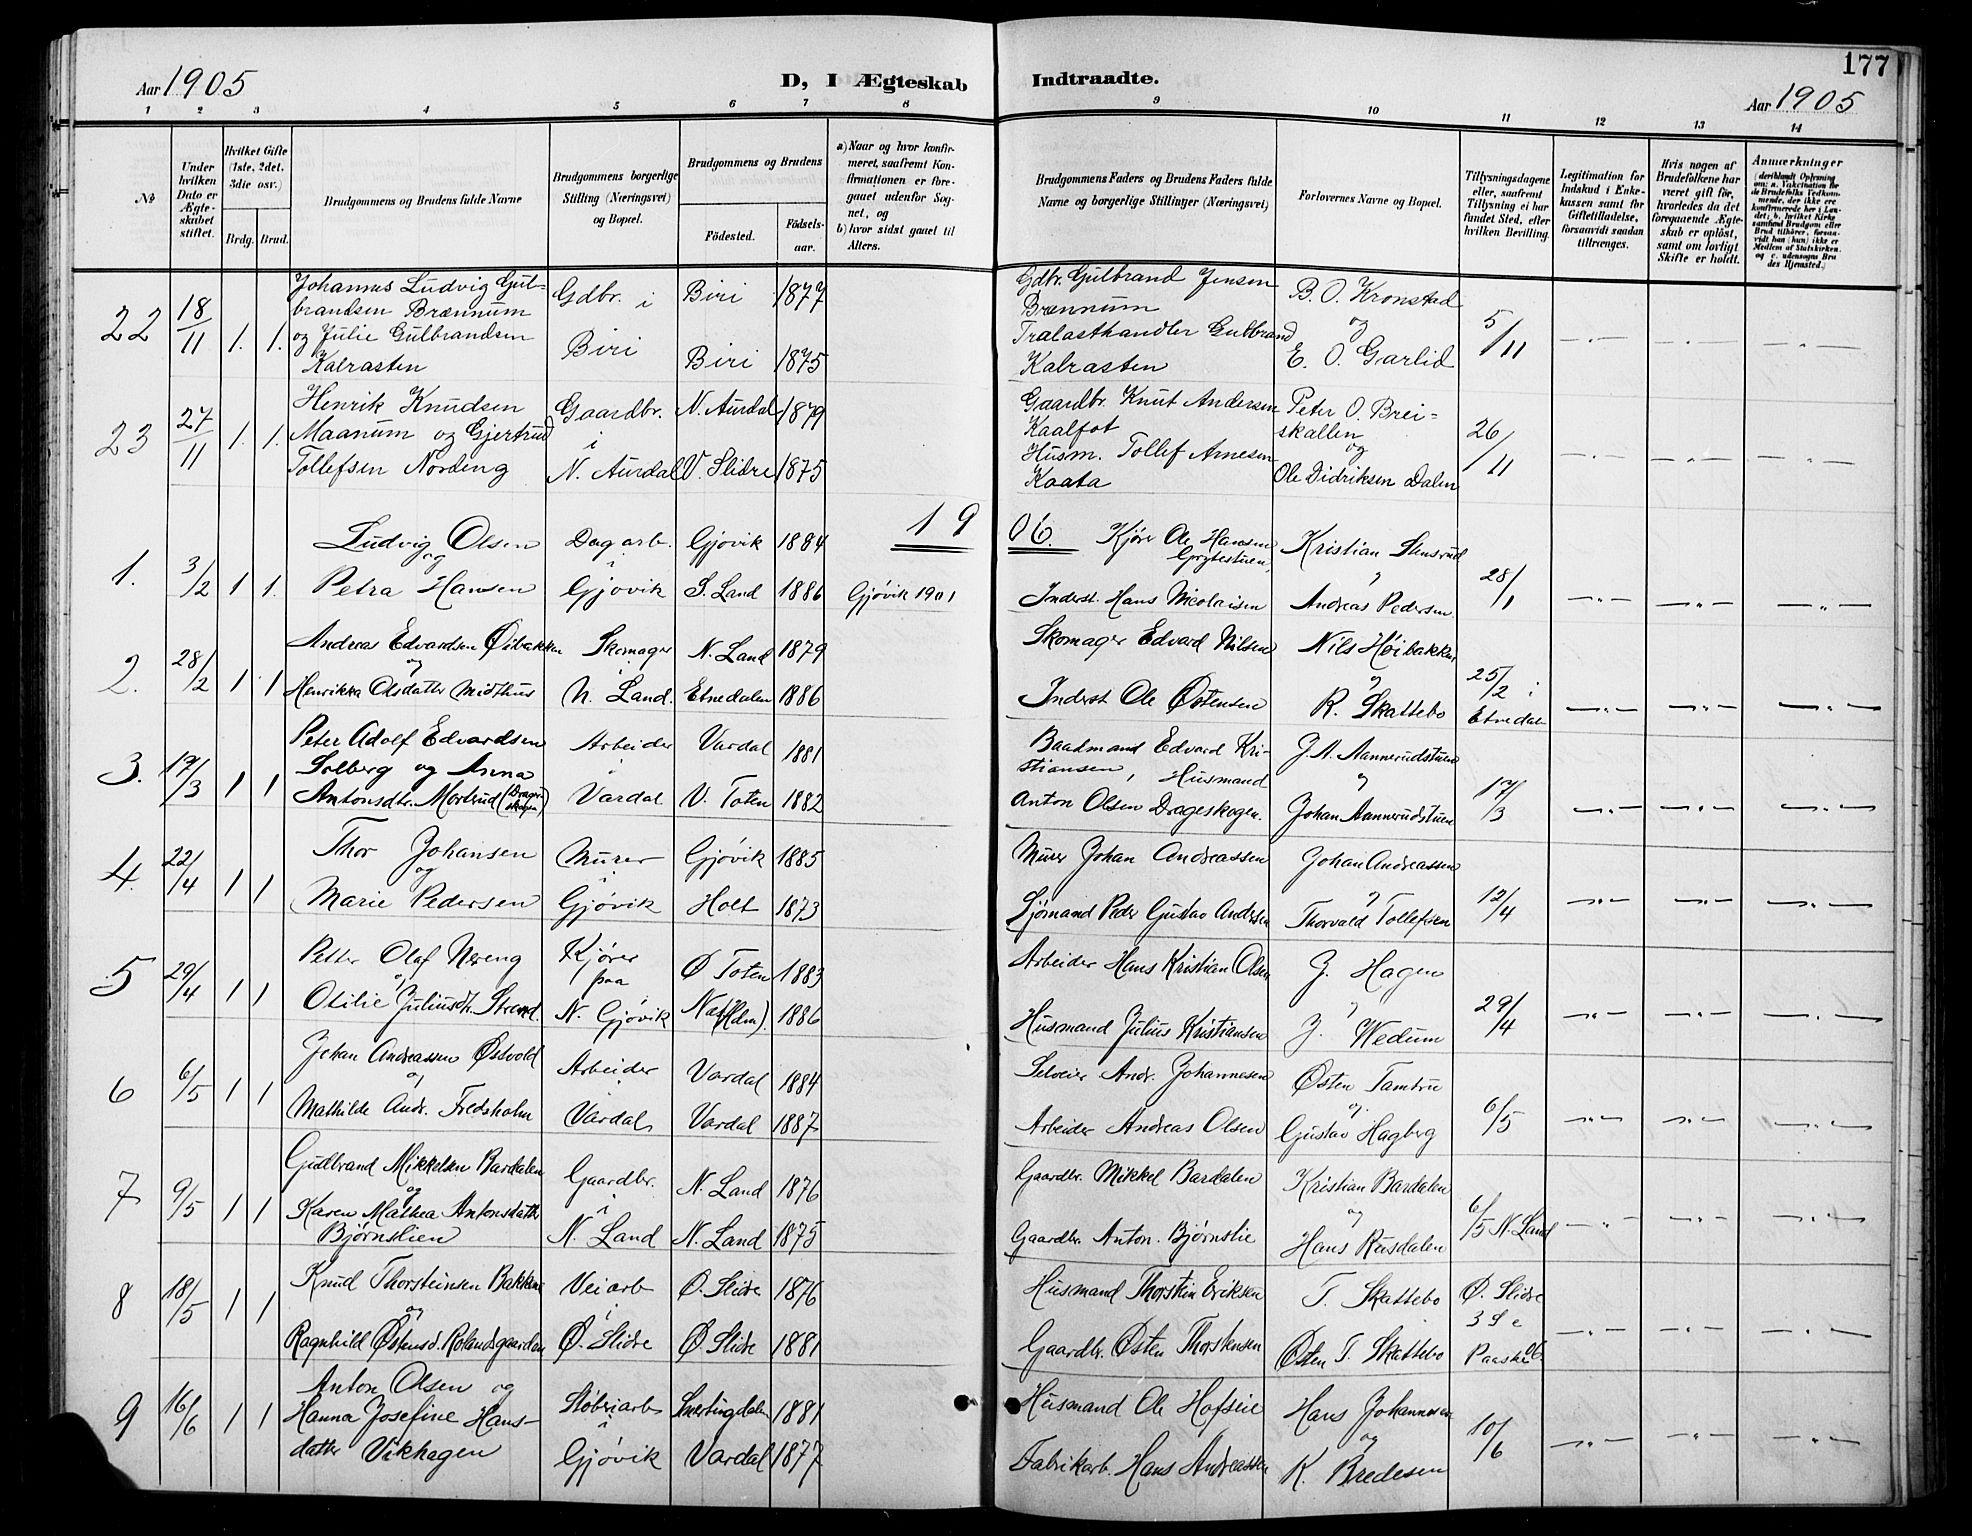 SAH, Vardal prestekontor, H/Ha/Hab/L0012: Klokkerbok nr. 12, 1902-1911, s. 177